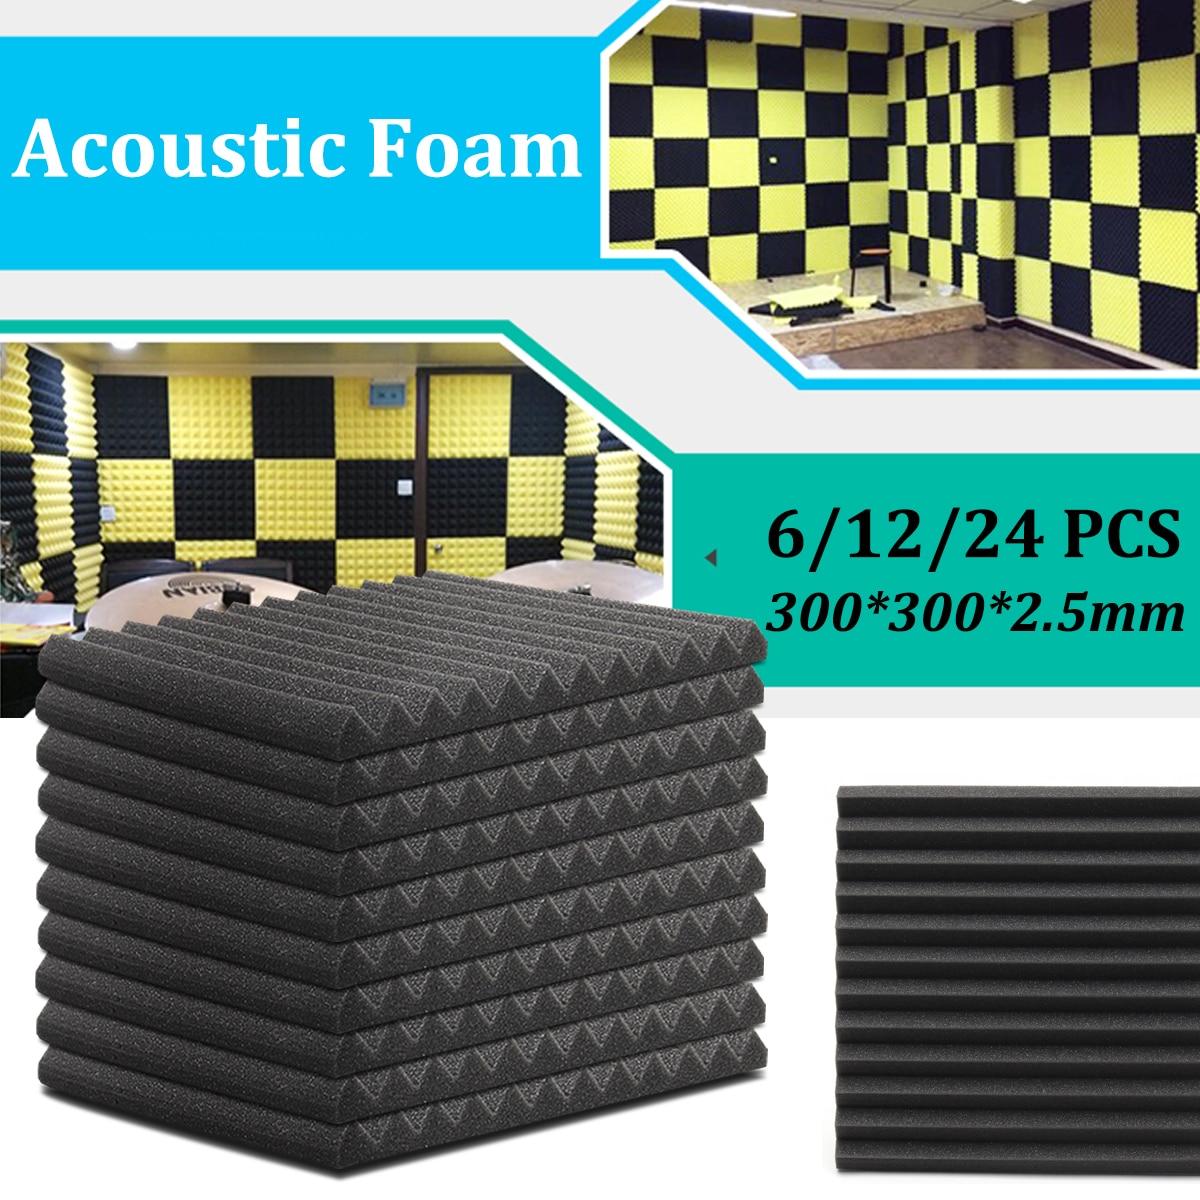 6Pcs /12Pcs 300*300*25mm Acoustic Soundproof Sound Stop Absorption Soundproofing Foam for KTV Audio Room Studio Room